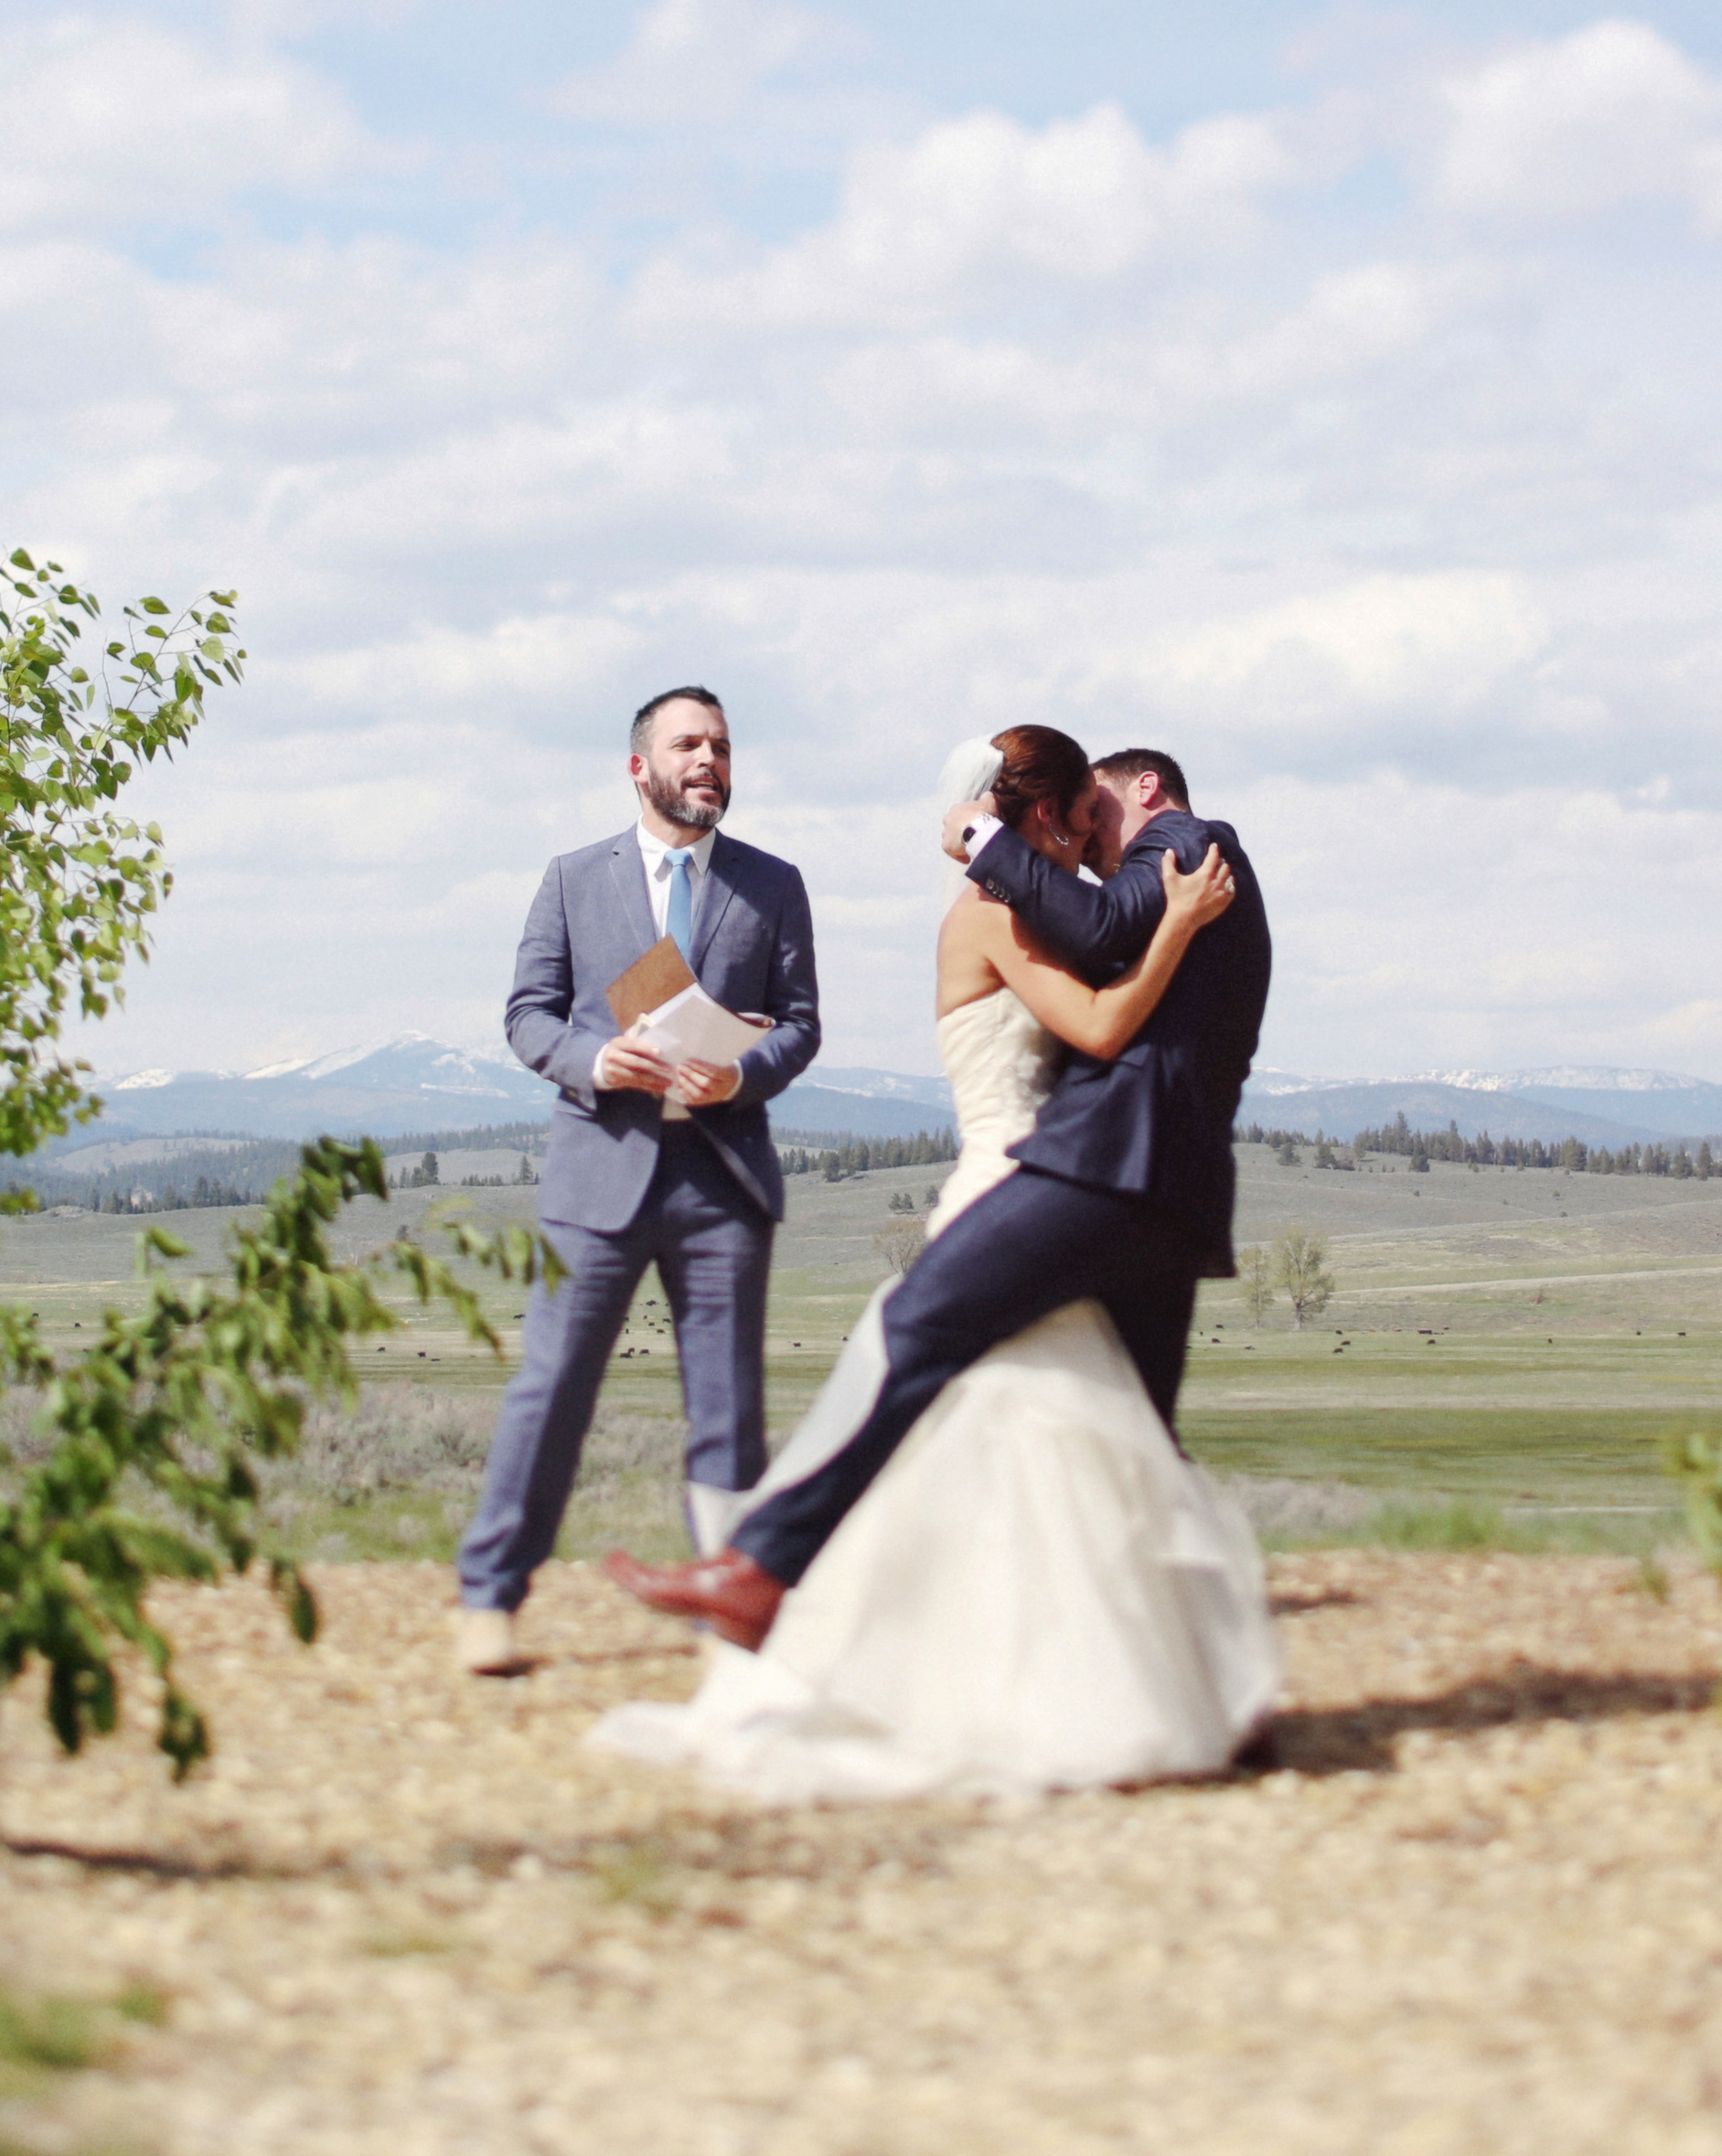 jamie-ryan-wedding-kiss-046-s111523-0914.jpg